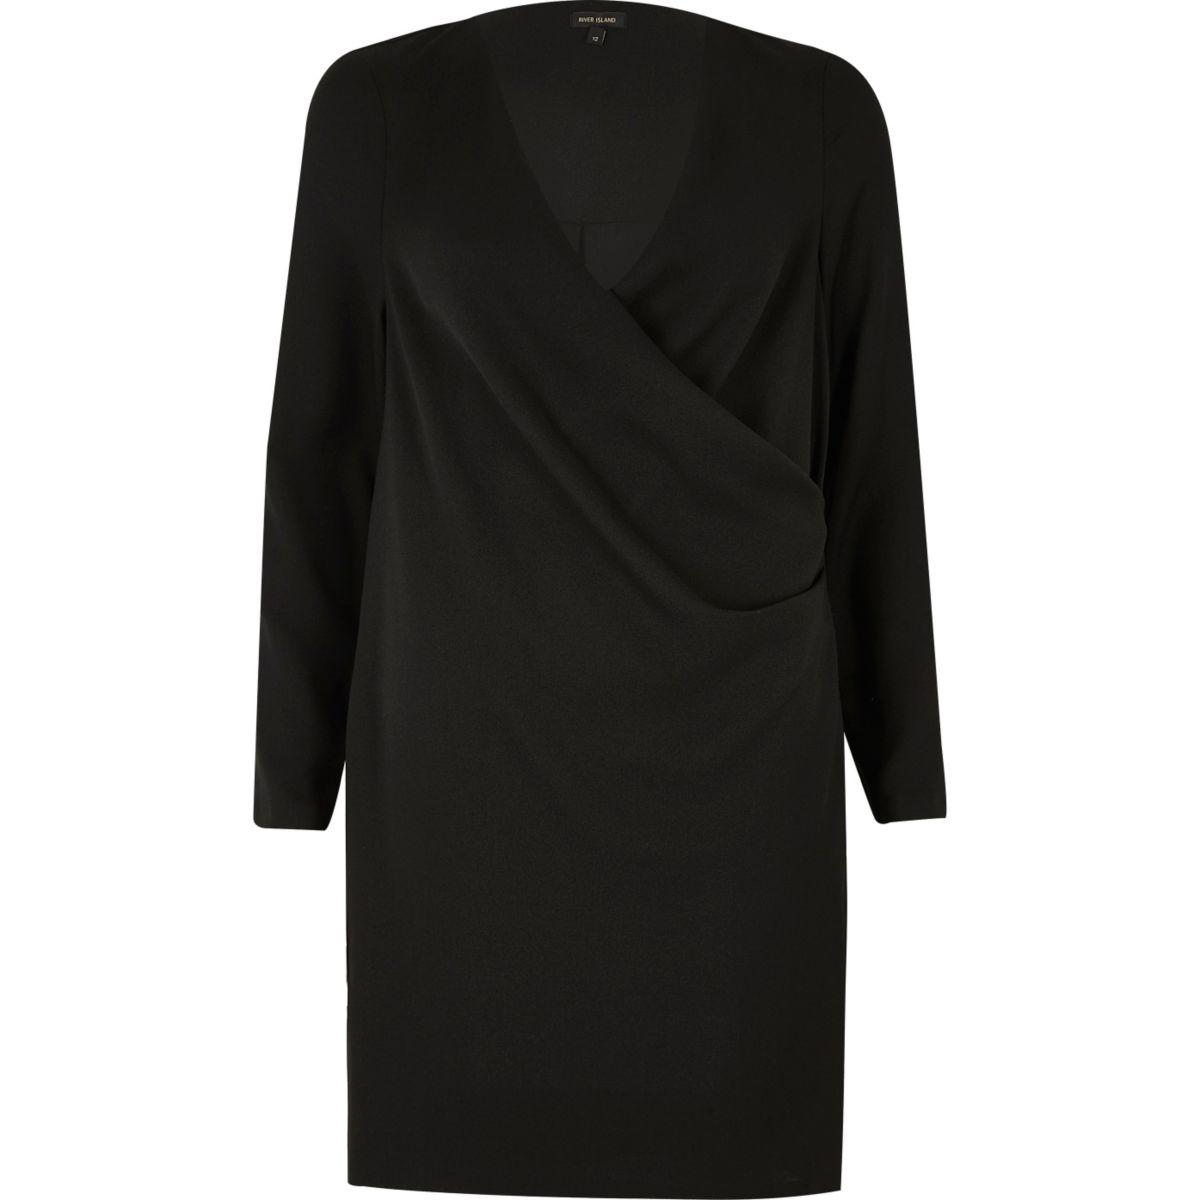 Schwarzes, drapiertes Swing-Kleid